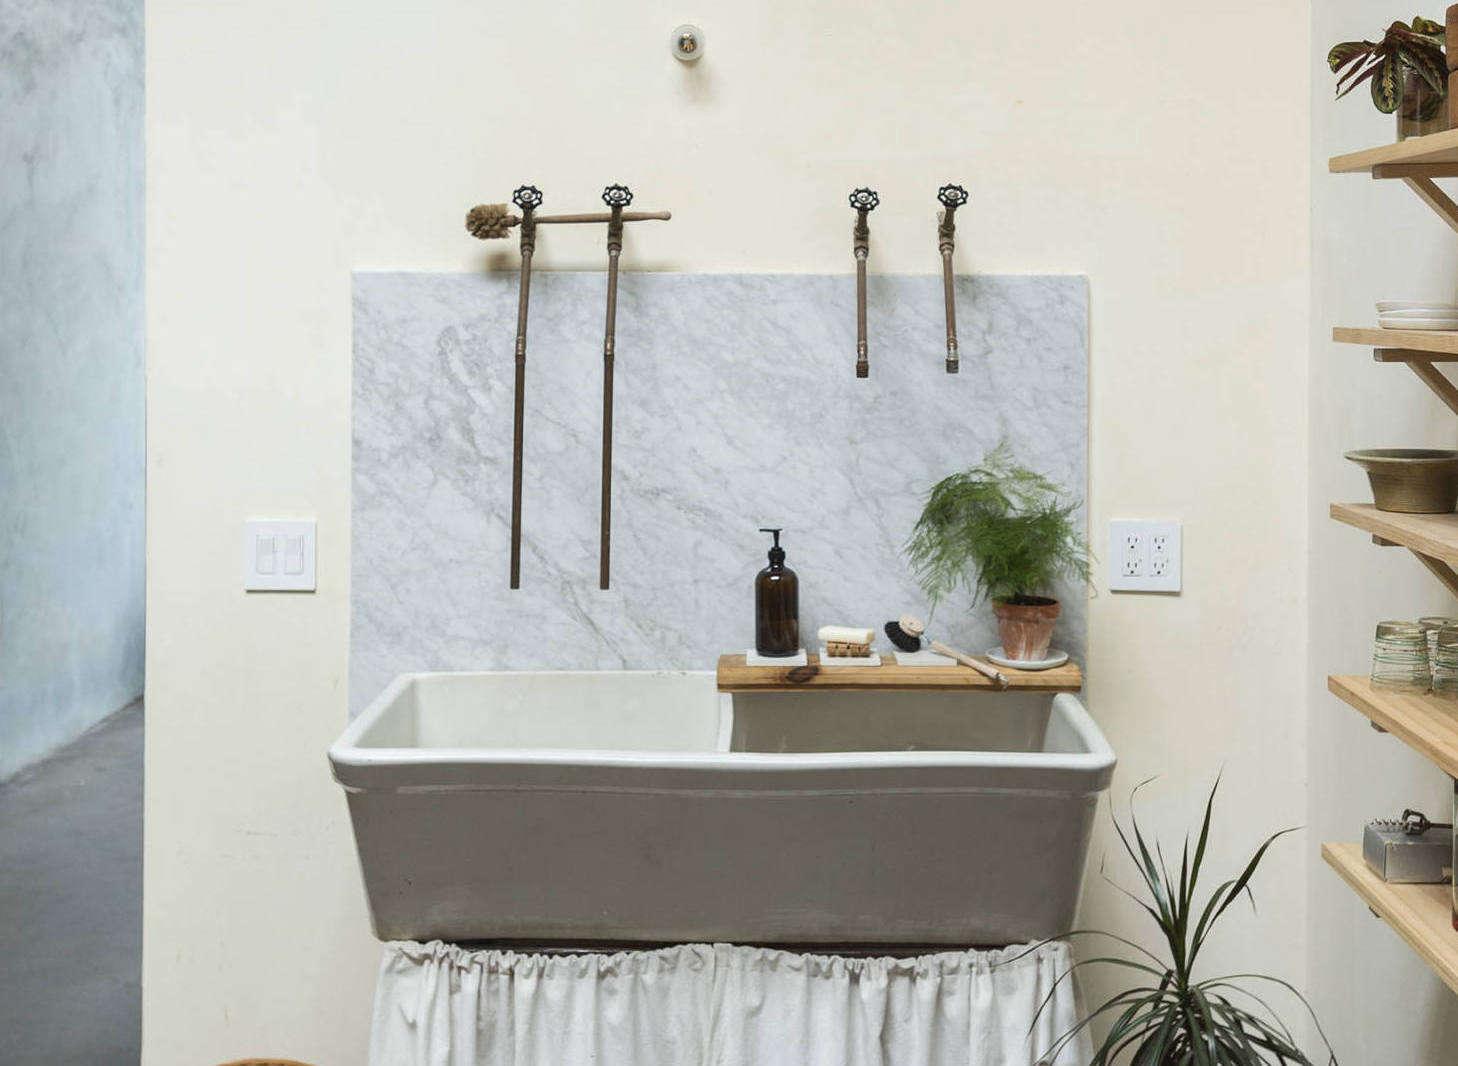 fabr studio brooklyn studio kitchen sink cropped cover